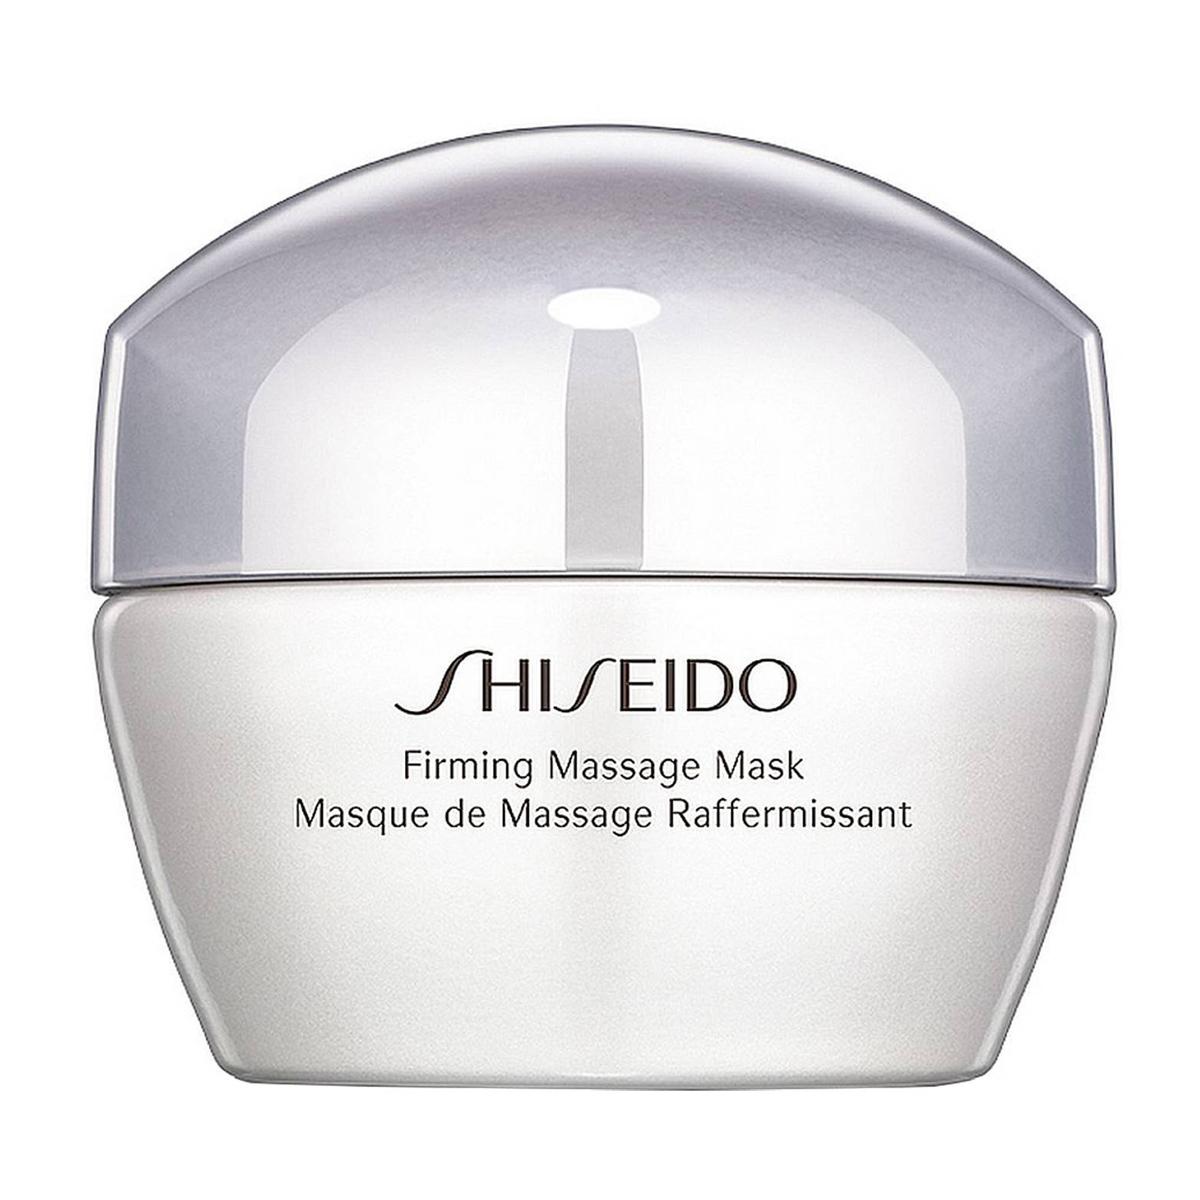 Shiseido - Masque de Massage Raffermissant - 50 ml